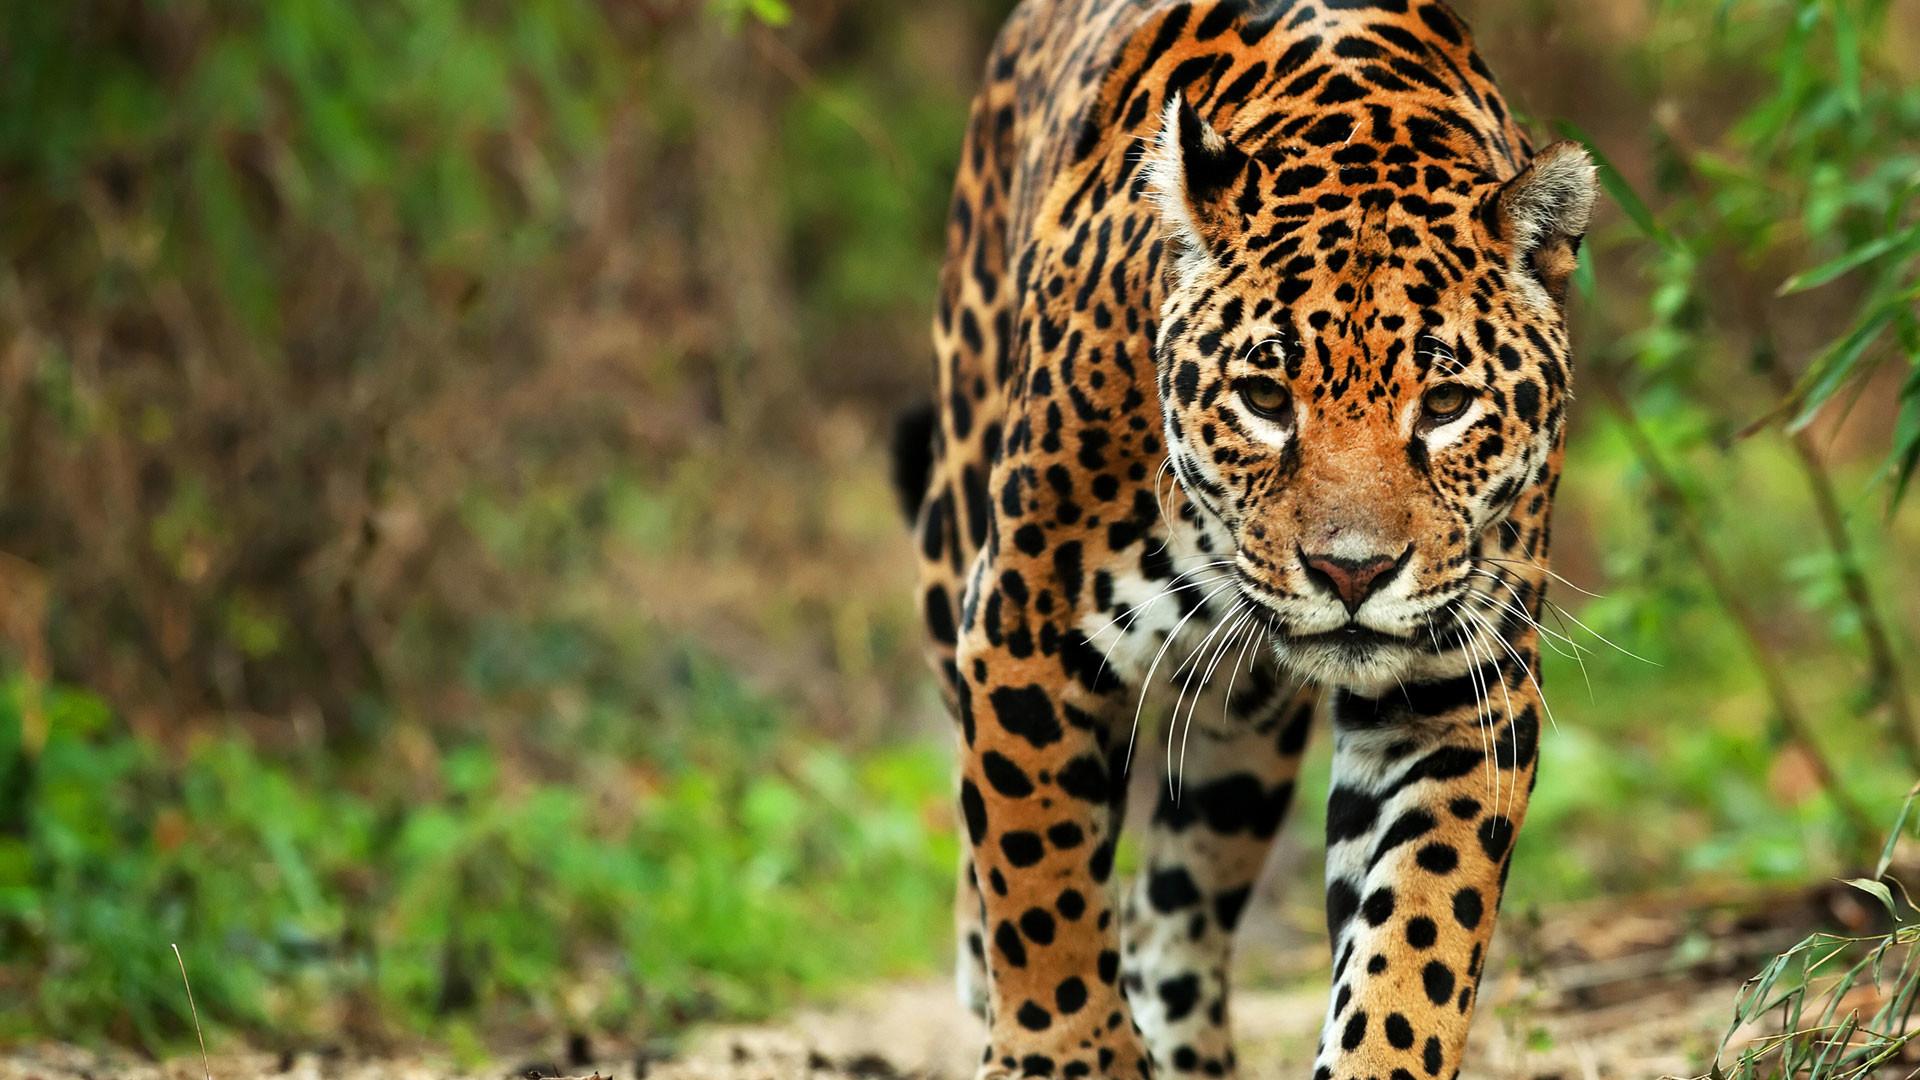 1920x1080, Jaguar - Jaguar Brazilian - HD Wallpaper